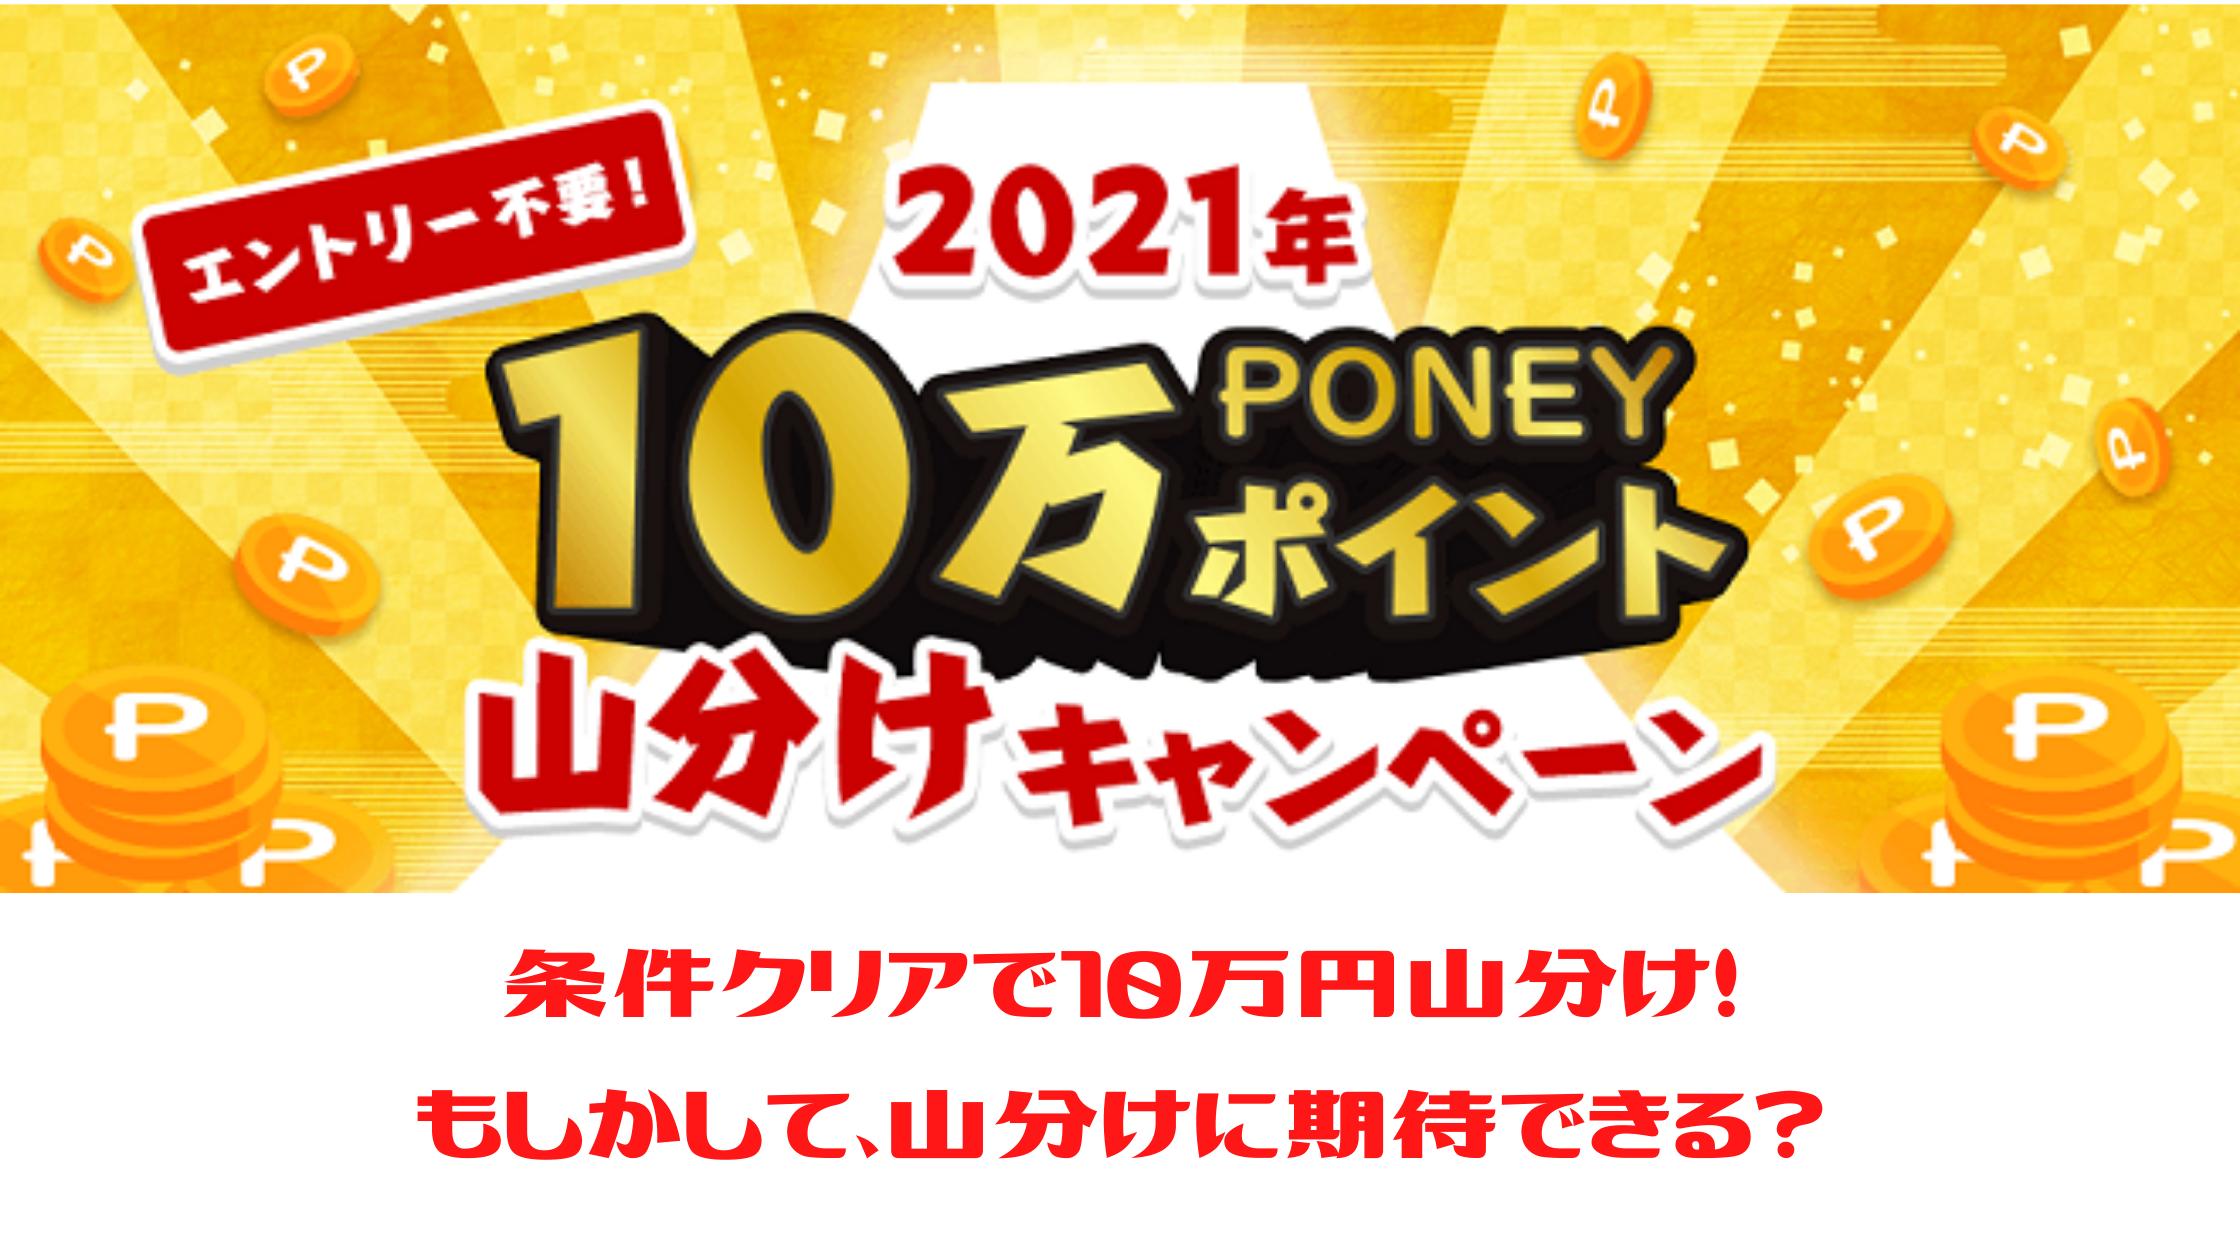 PONEY 条件クリア10万円山分け!もしかして、山分けに期待できる?